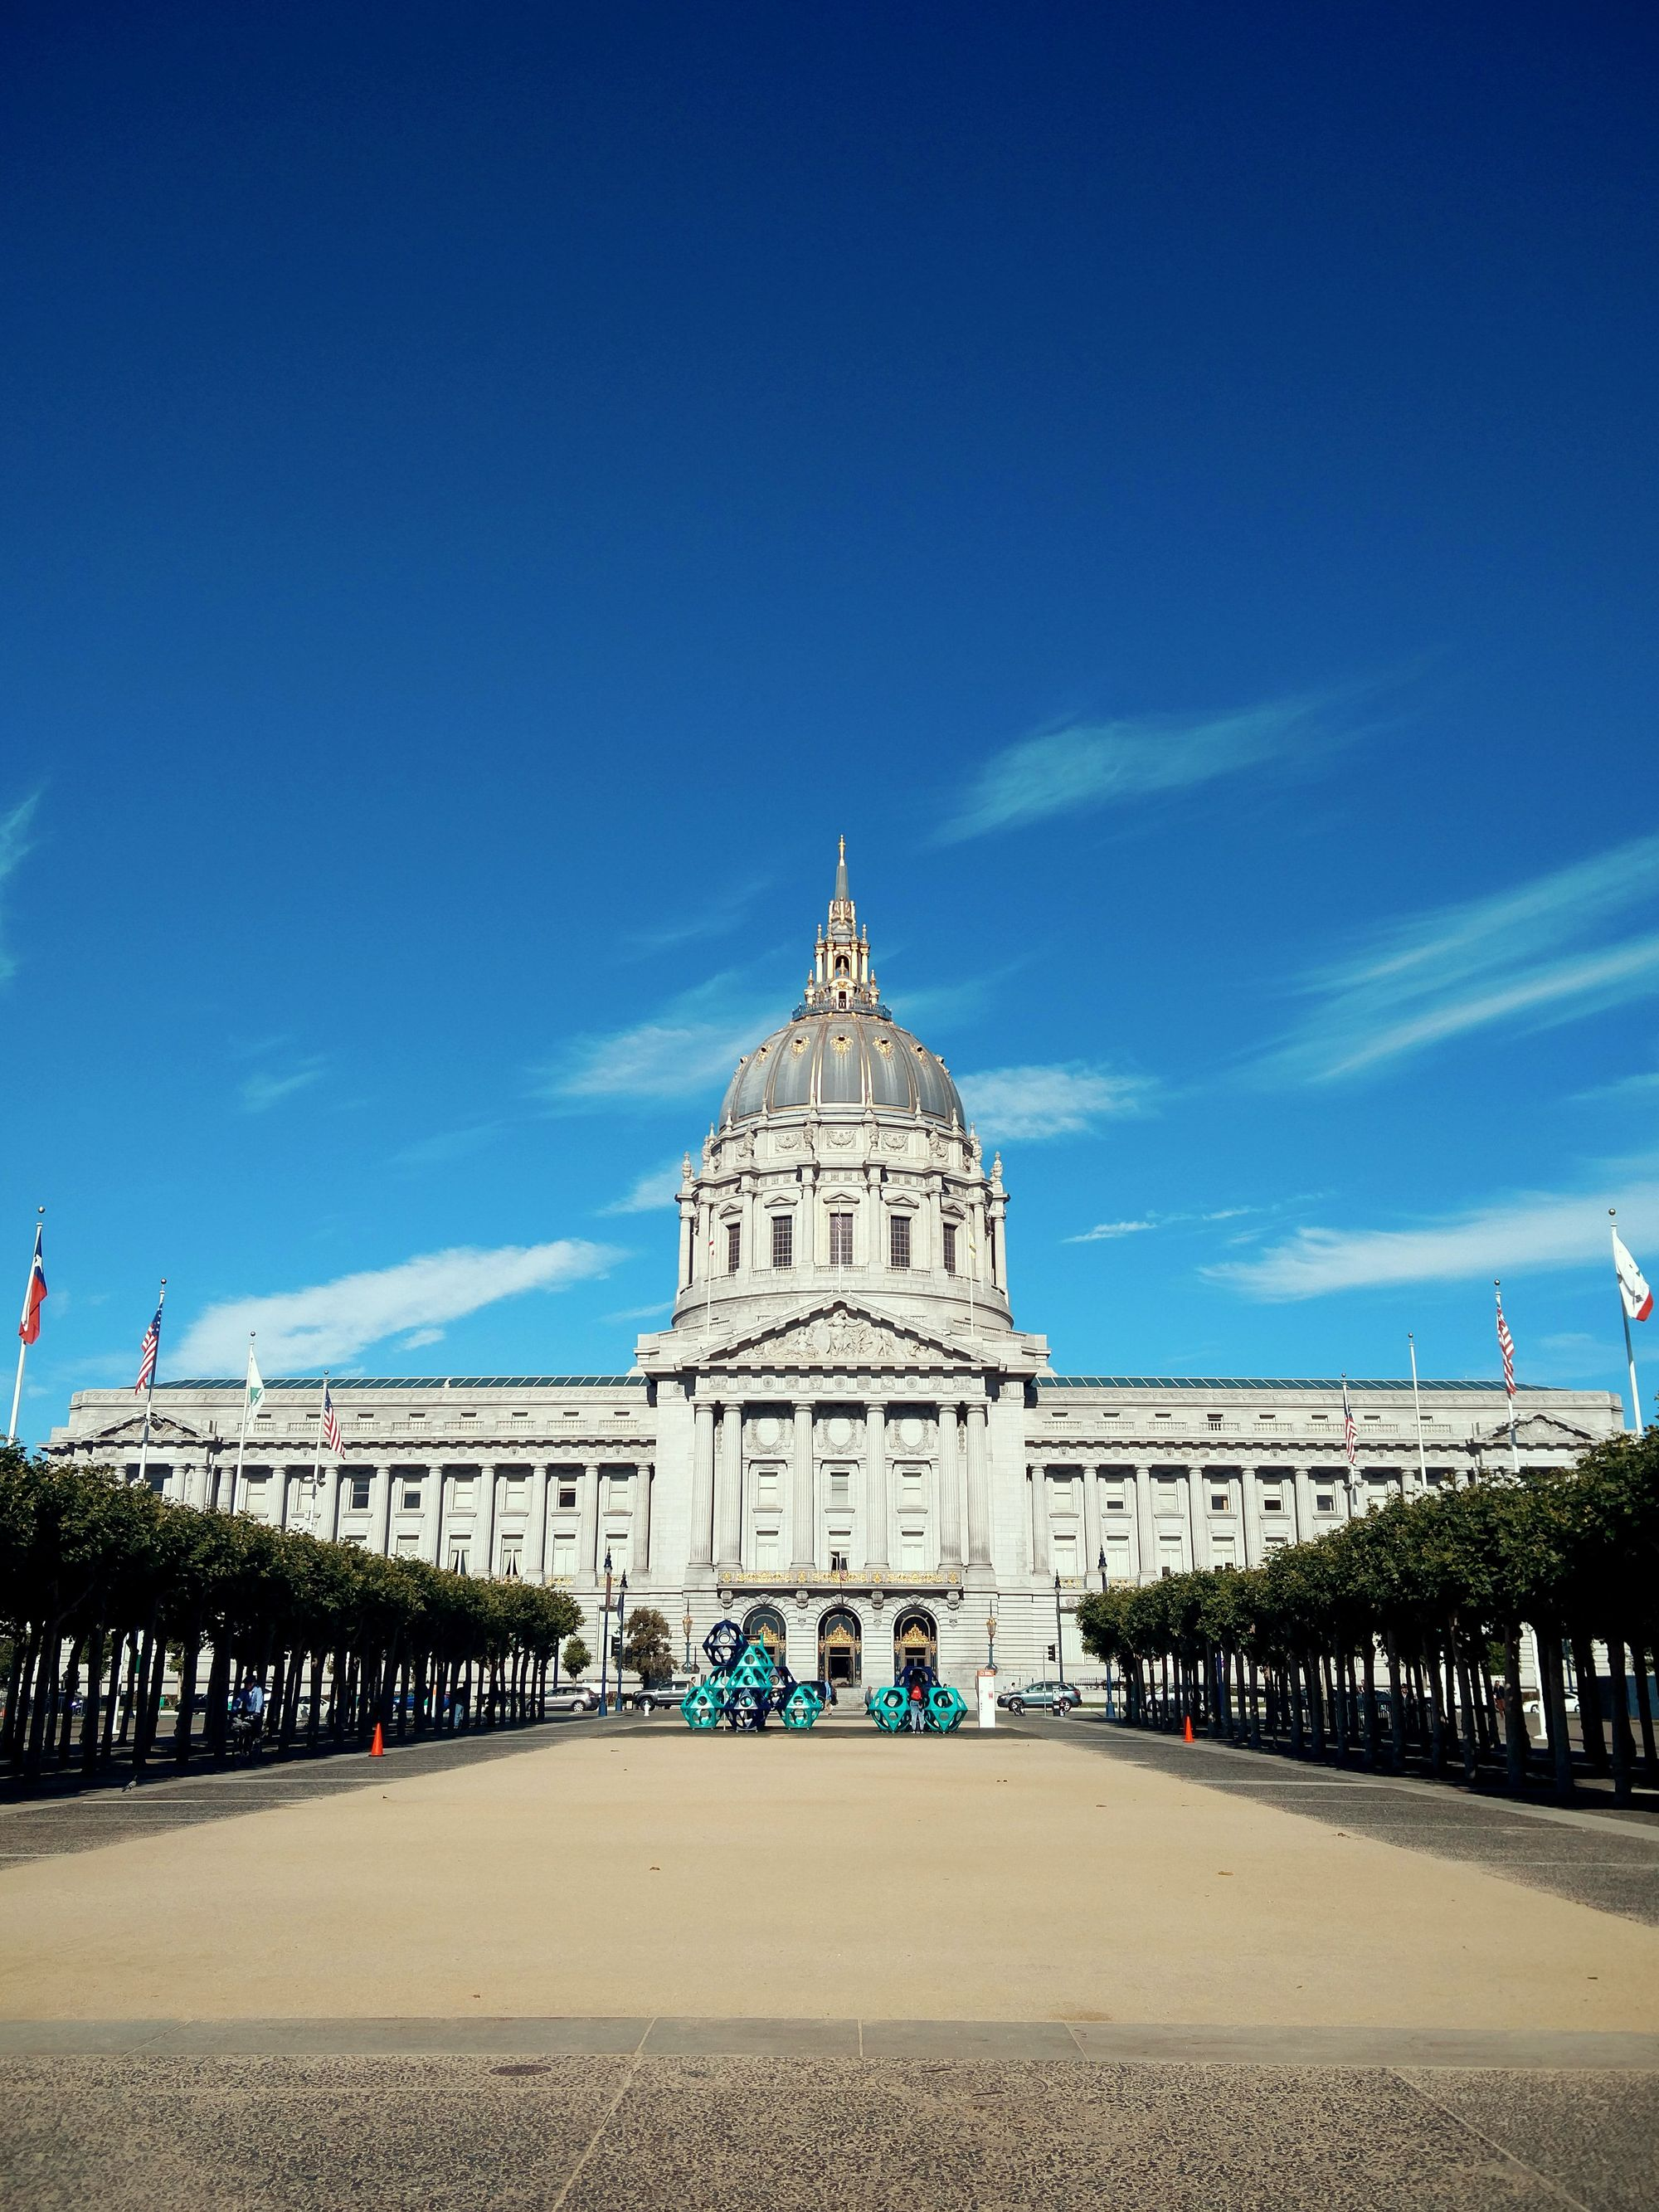 California eviction ban ends eviction moratorium pandmemic